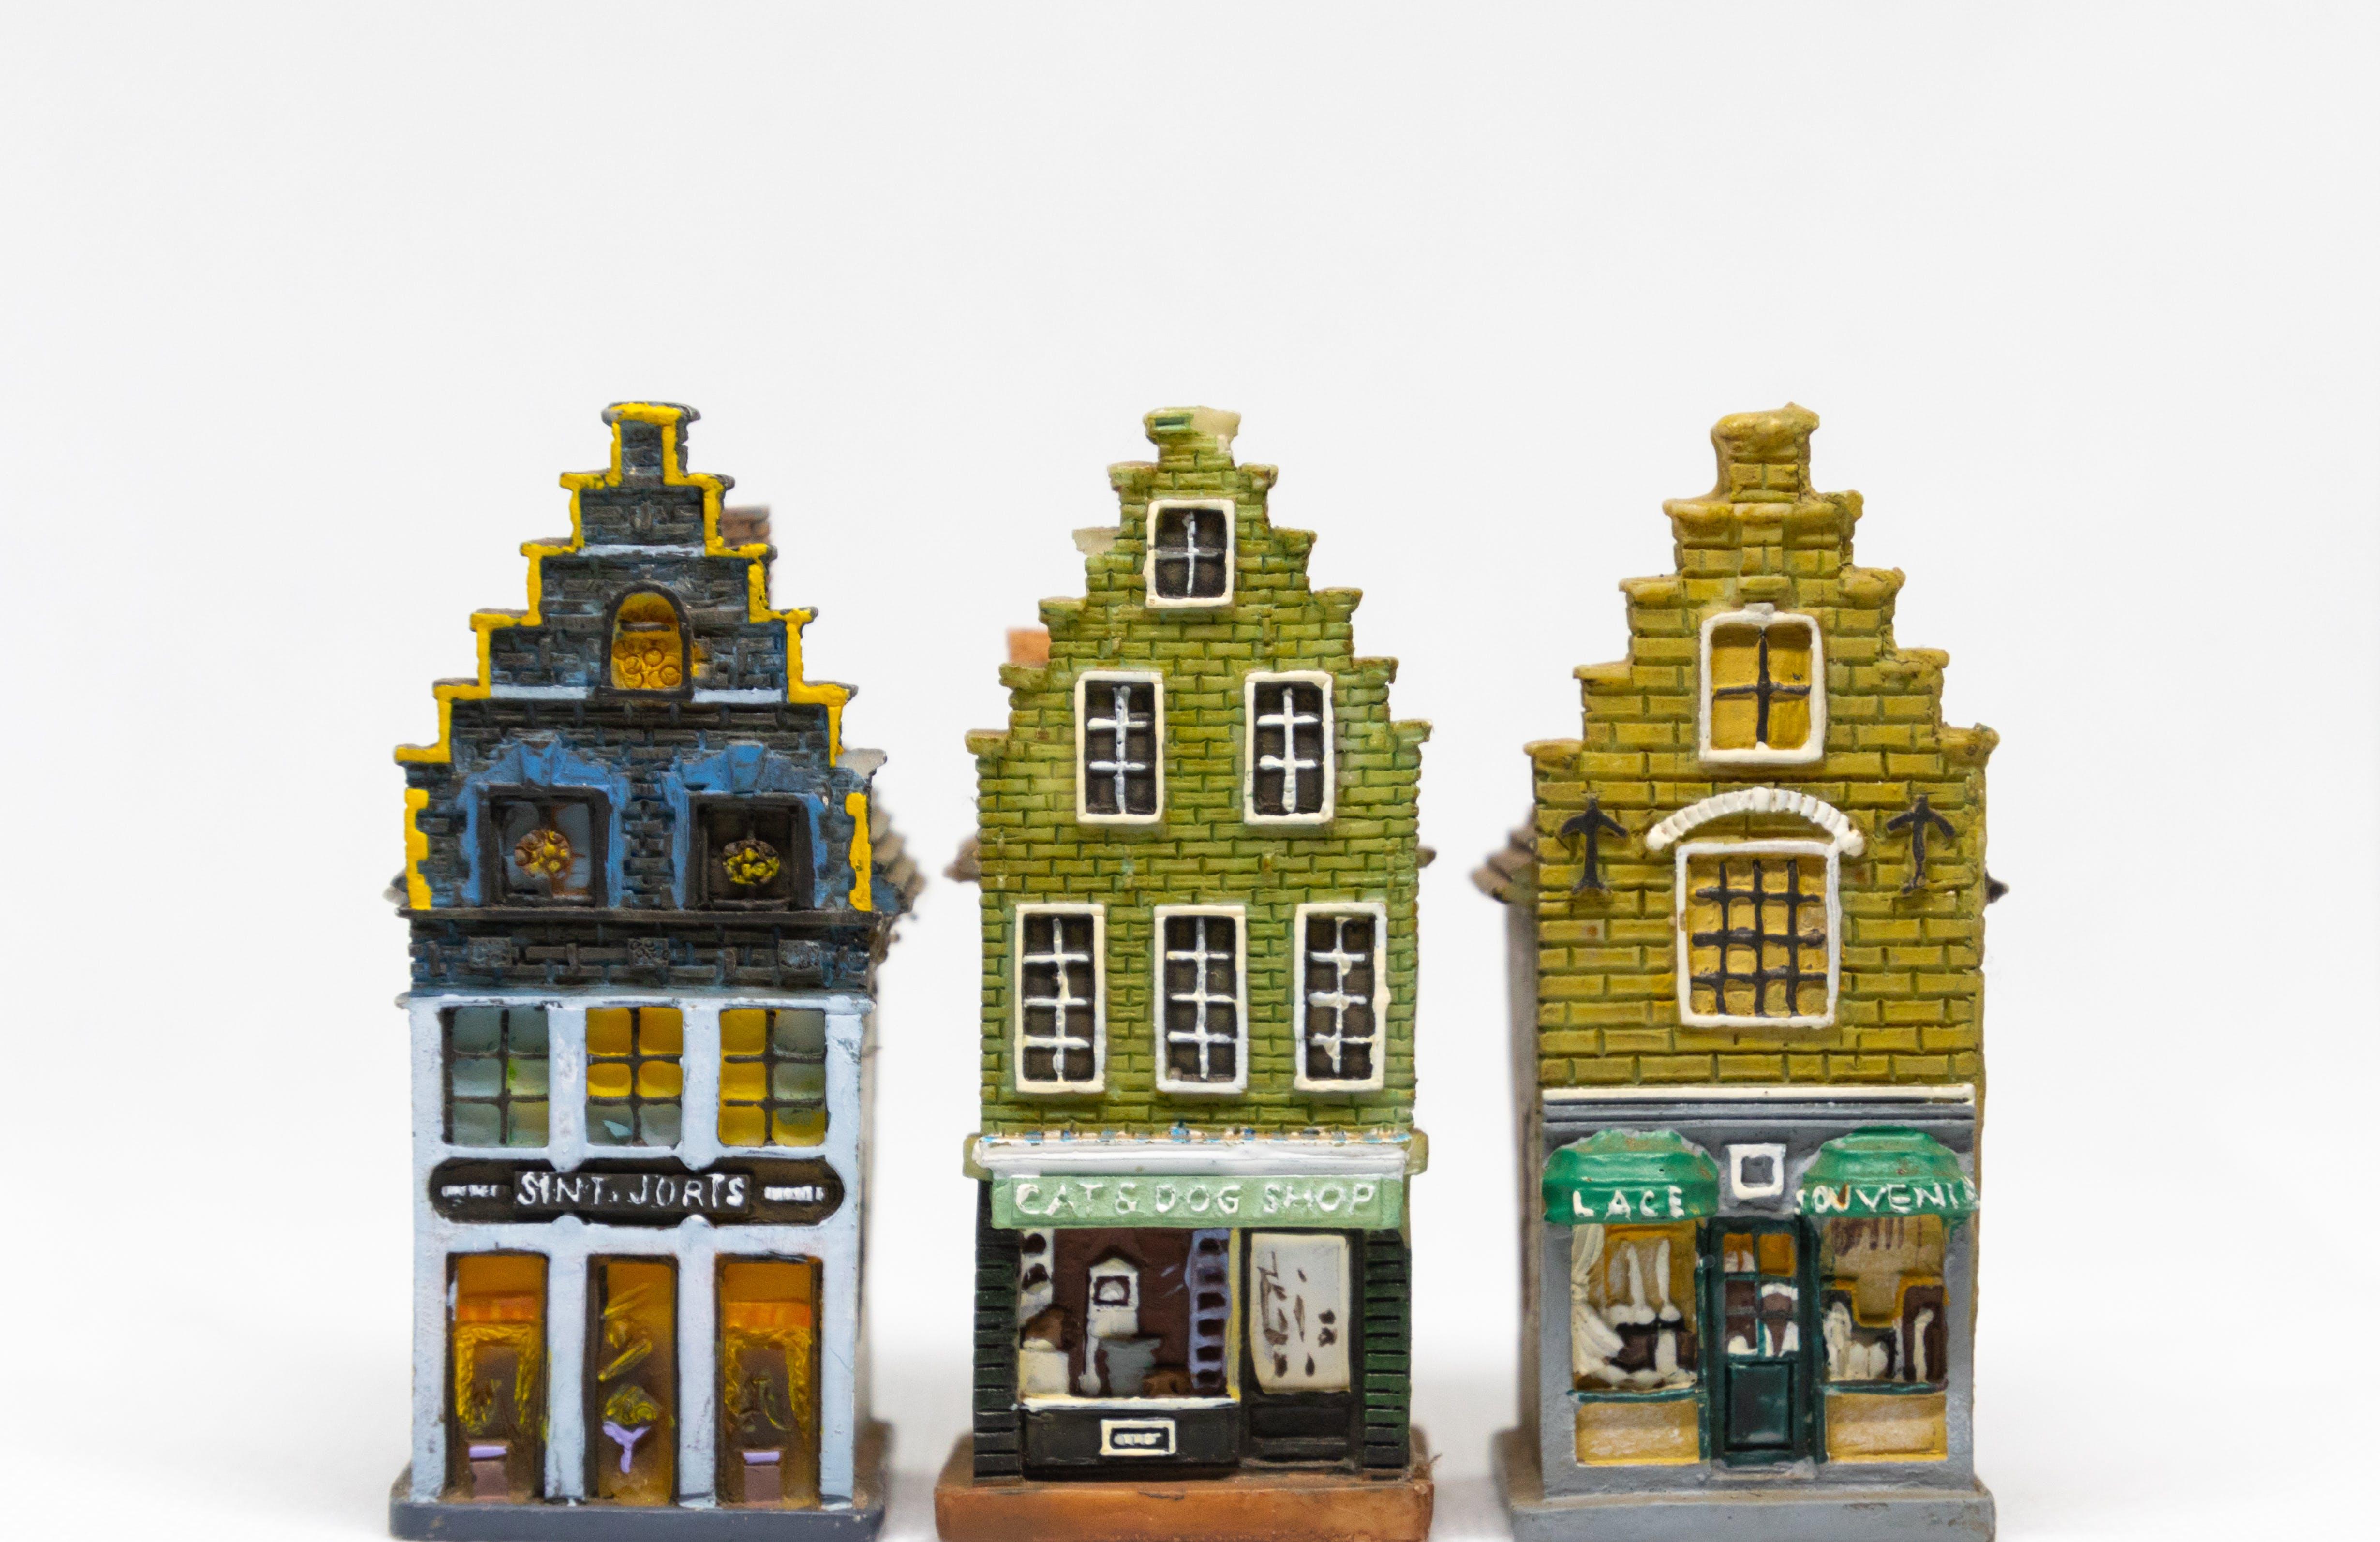 Free stock photo of people, village, house, windows